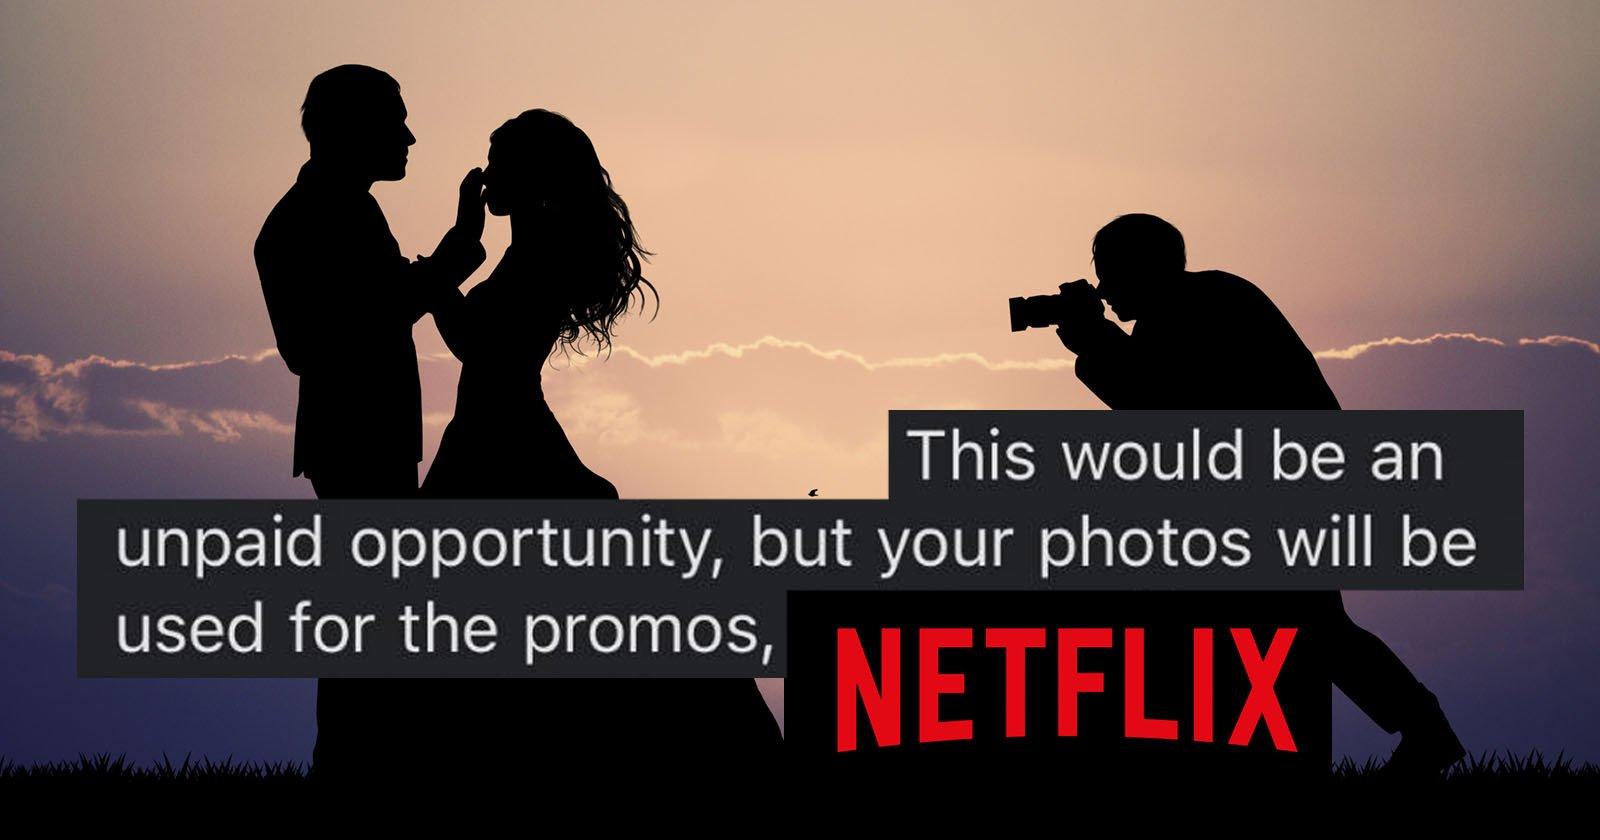 Netflix's 'Love is Blind' Wants Unpaid Photographer for Five Weddings